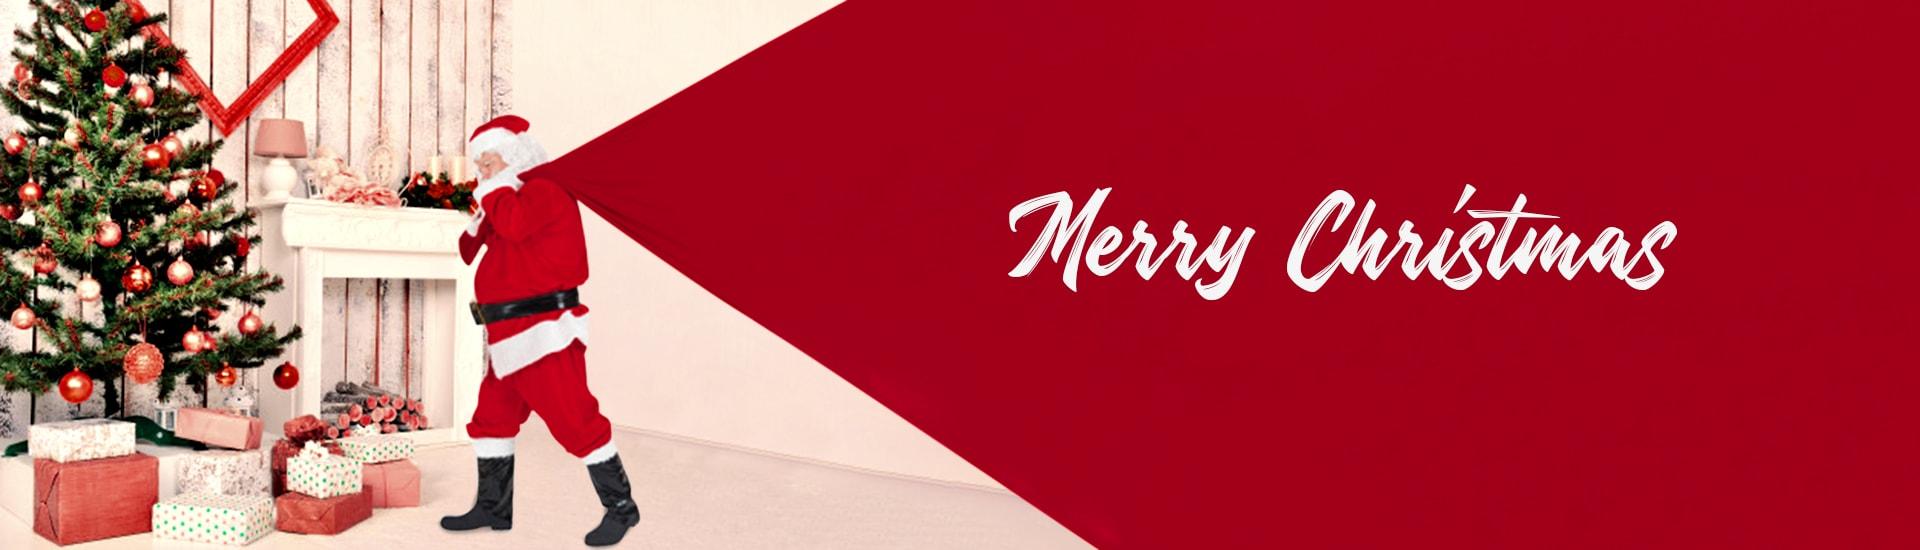 Christmas Celebration Xmas Quotes Messages 2020 Winni